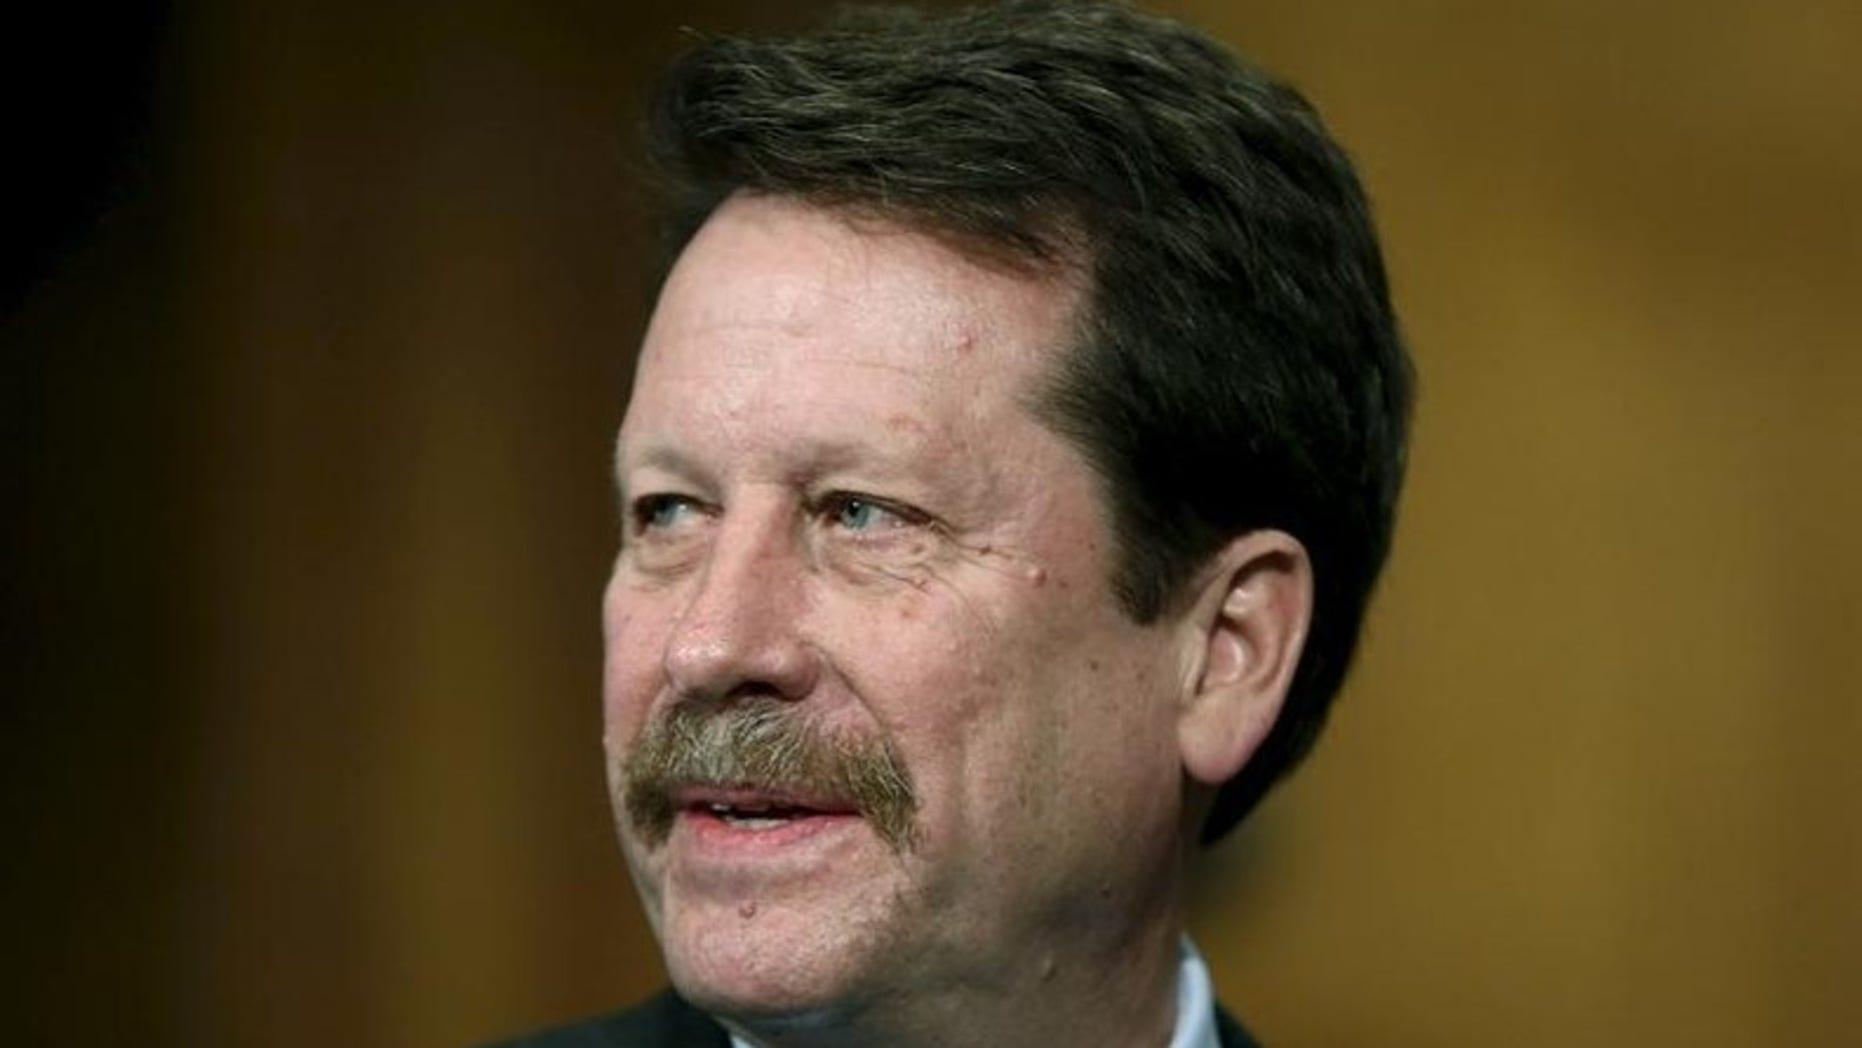 FDA Commissioner nominee Califf testifies at nomination hearing in Washington